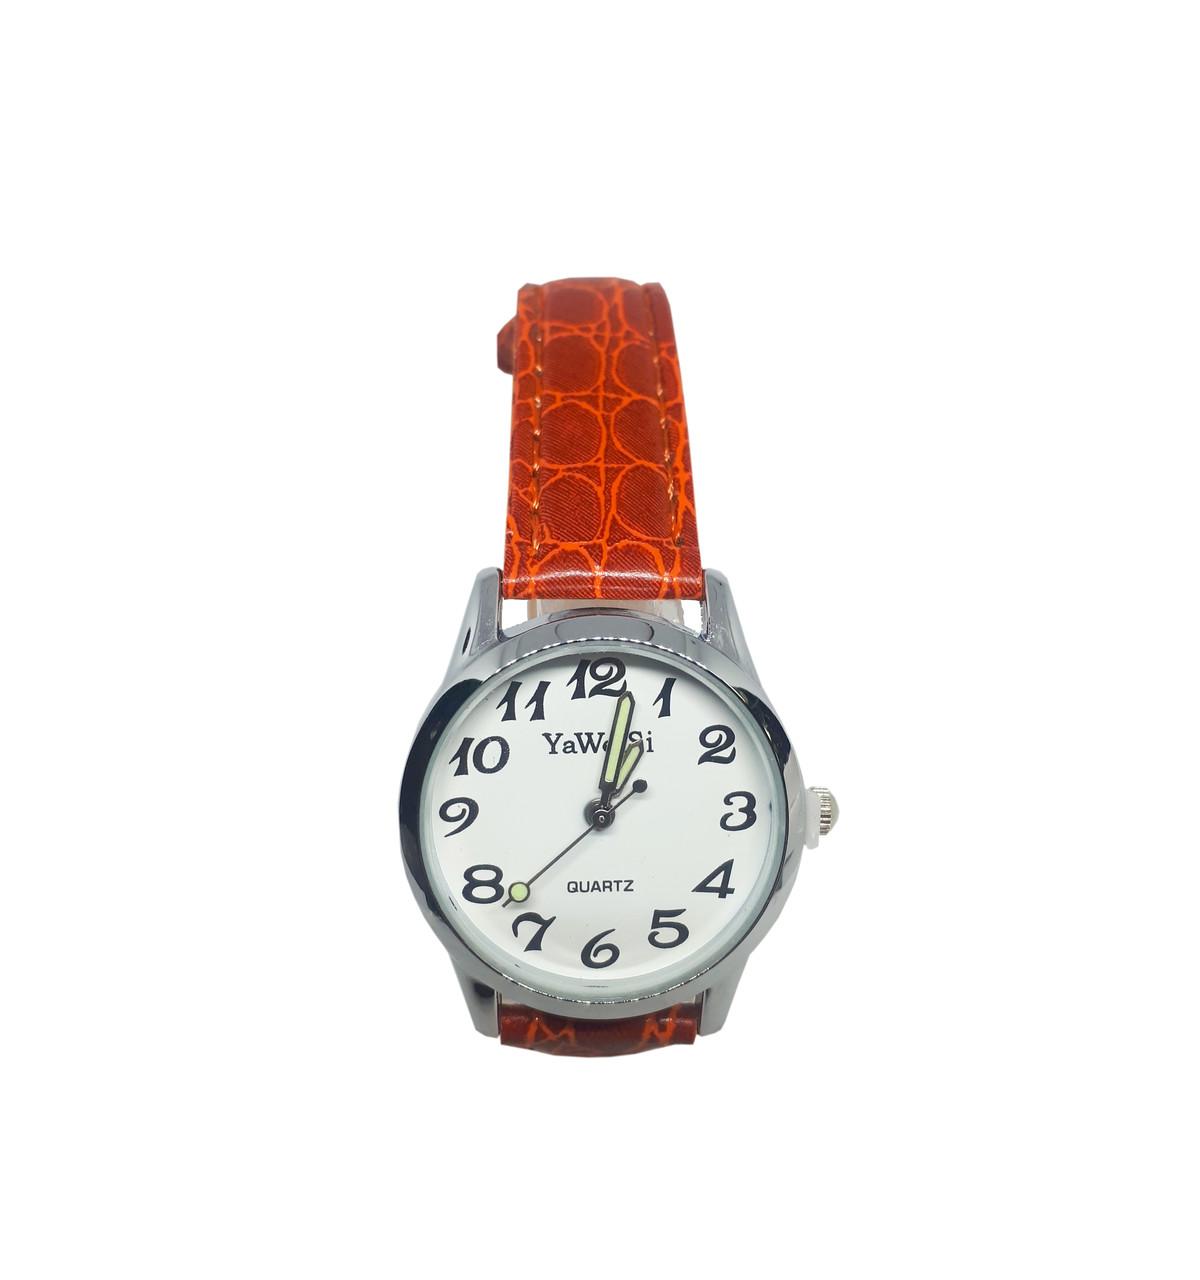 Часы кварцевые Yiweisi Silver женские белые на рыжем ремешке